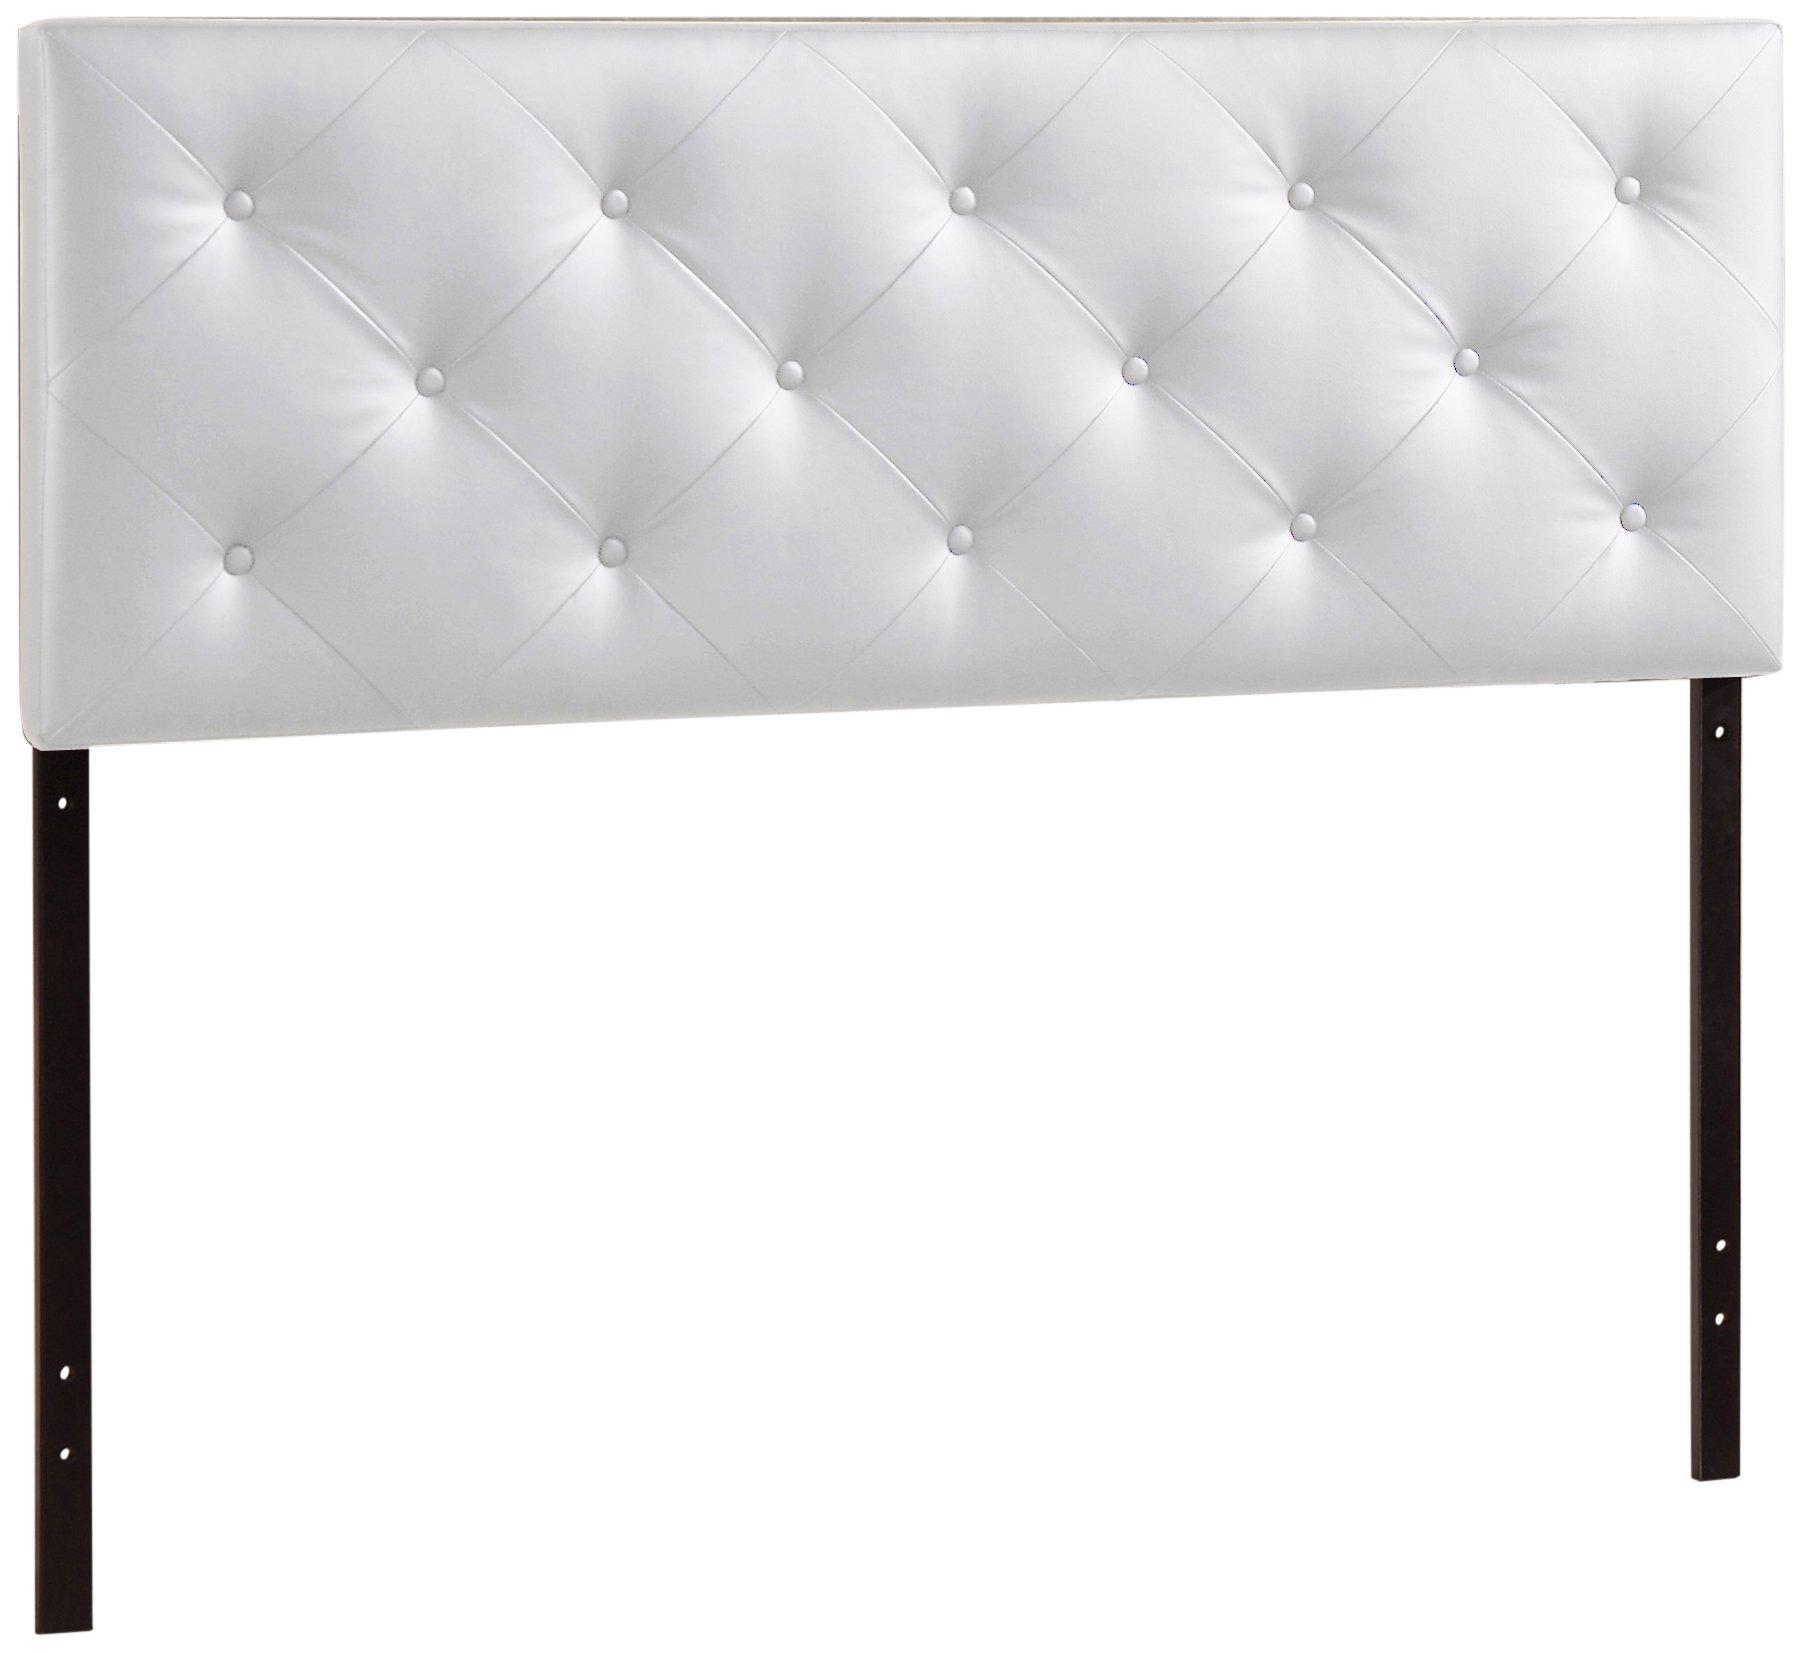 Baxton Studio Wholesale Interiors Baltimore Contemporary Faux Leather Headboard, Full, White by Baxton Studio